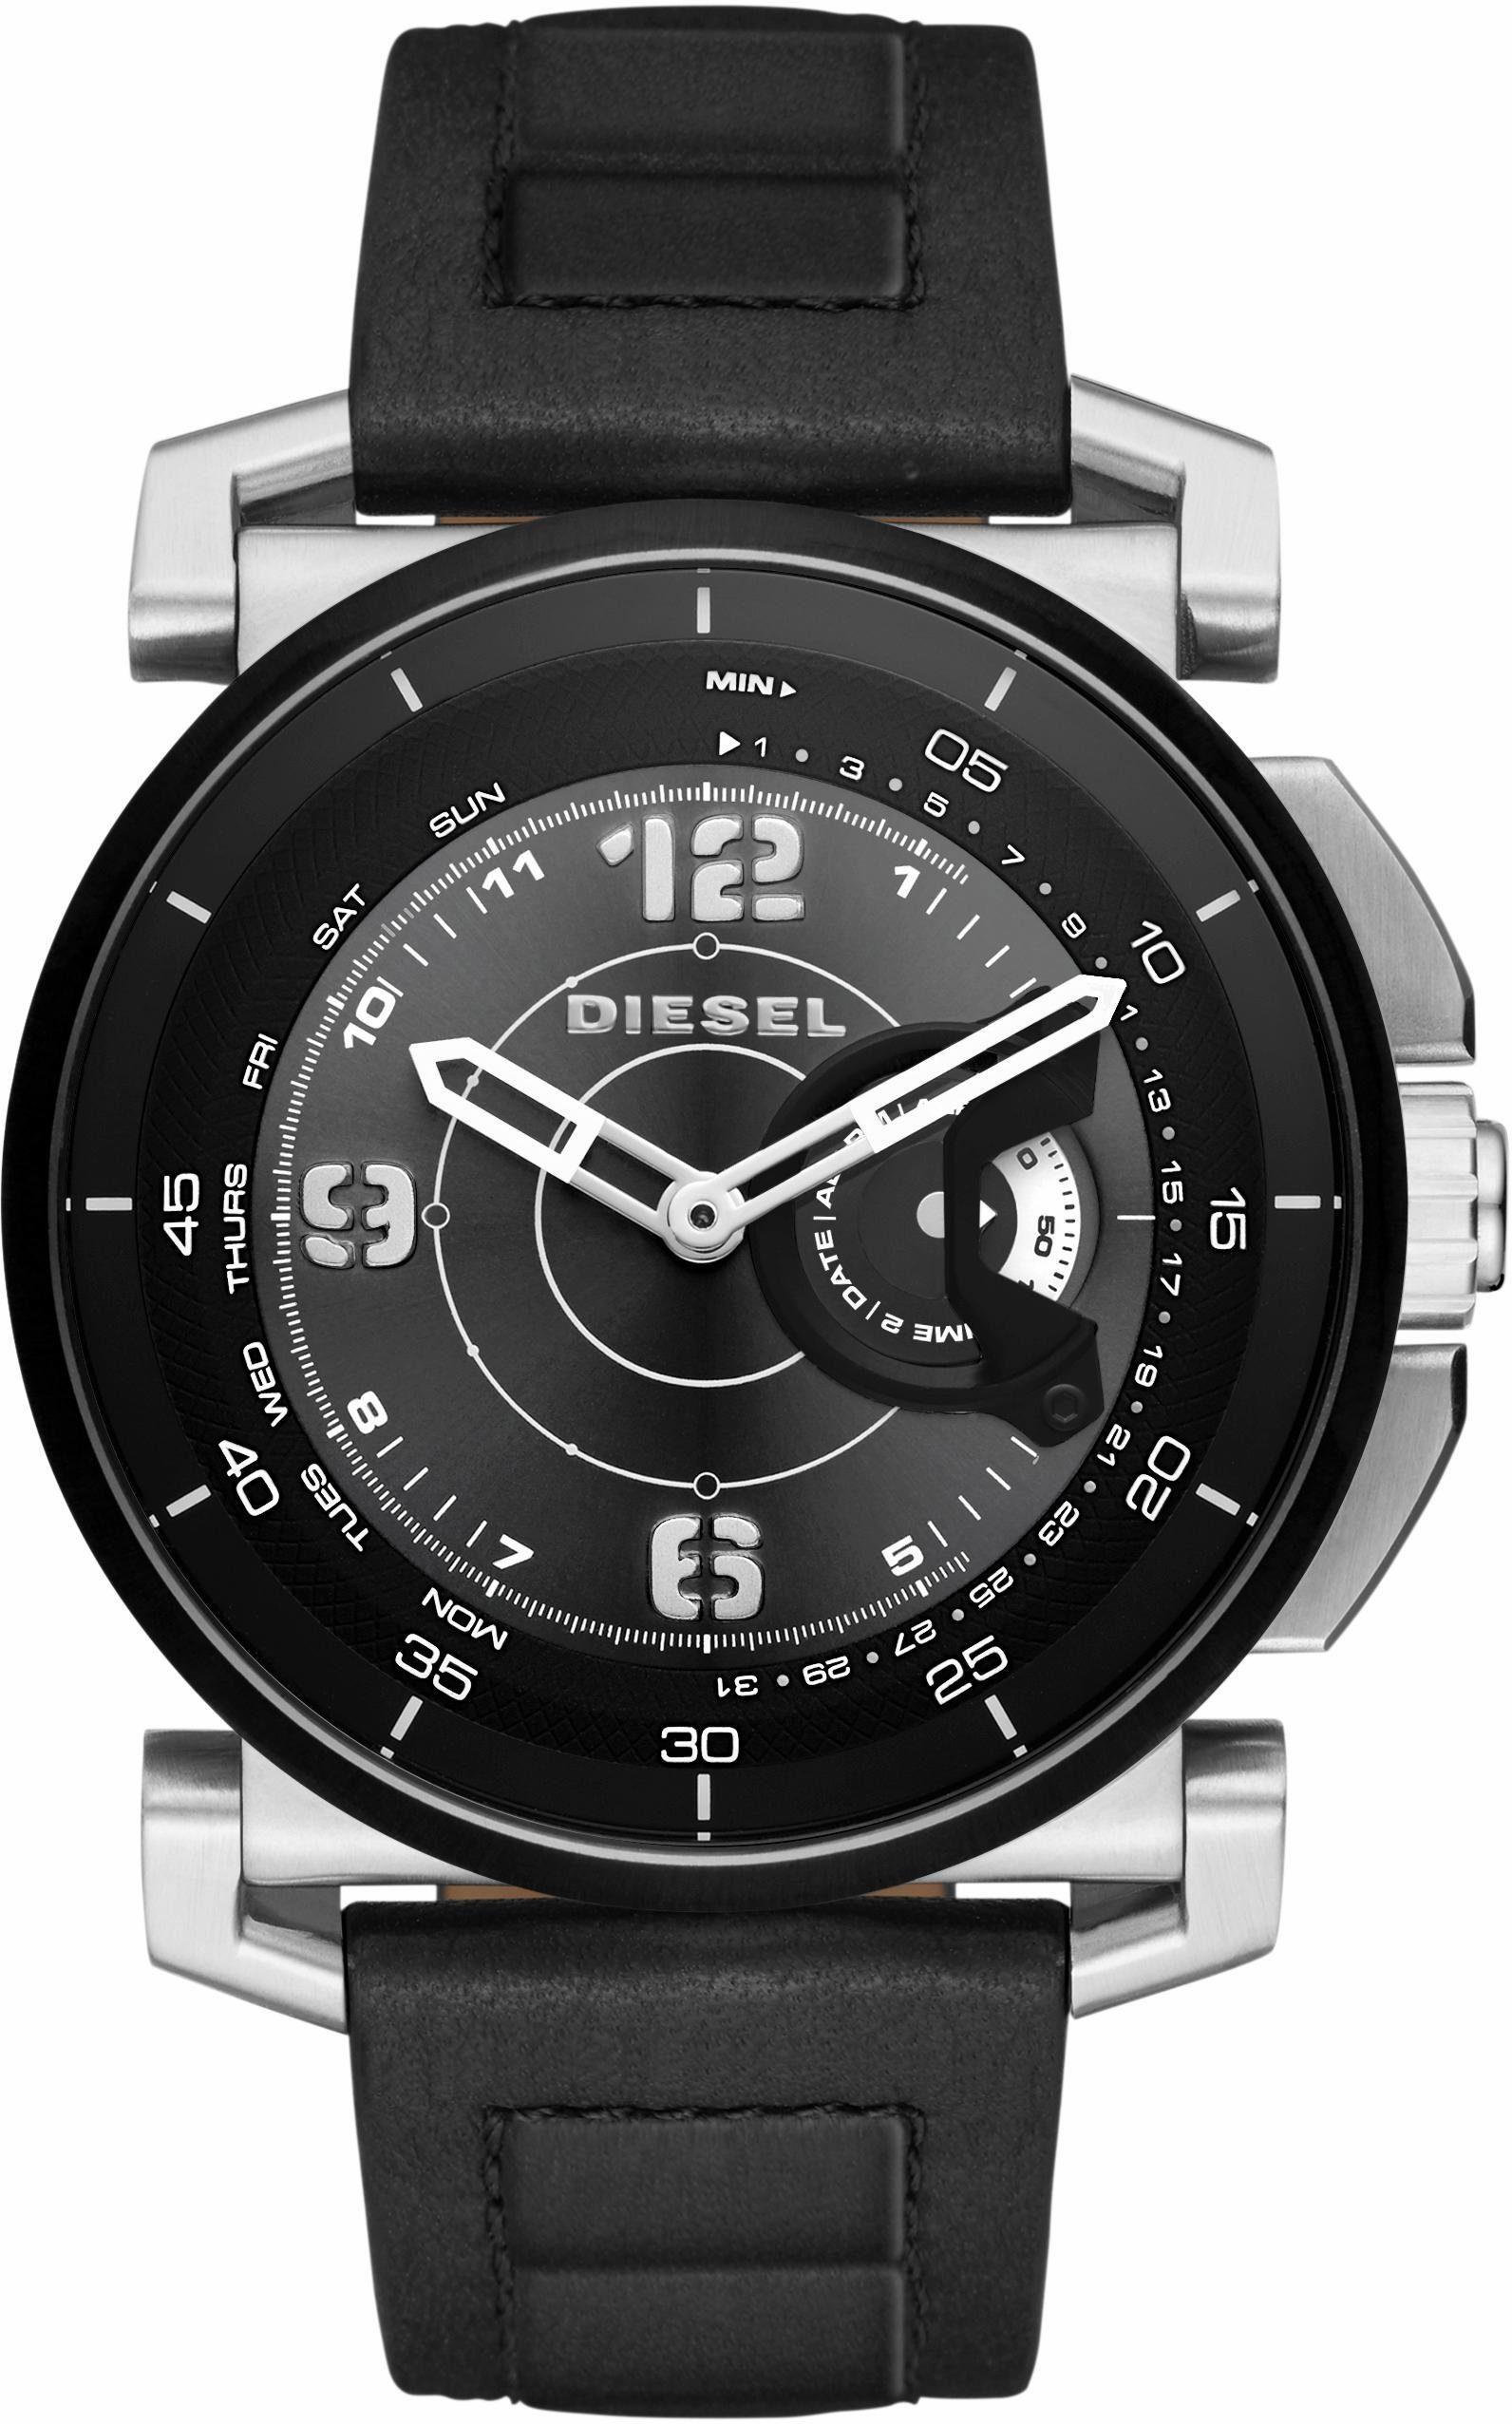 DIESEL ON ADVANCED, DZT1000 Smartwatch (Android Wear)